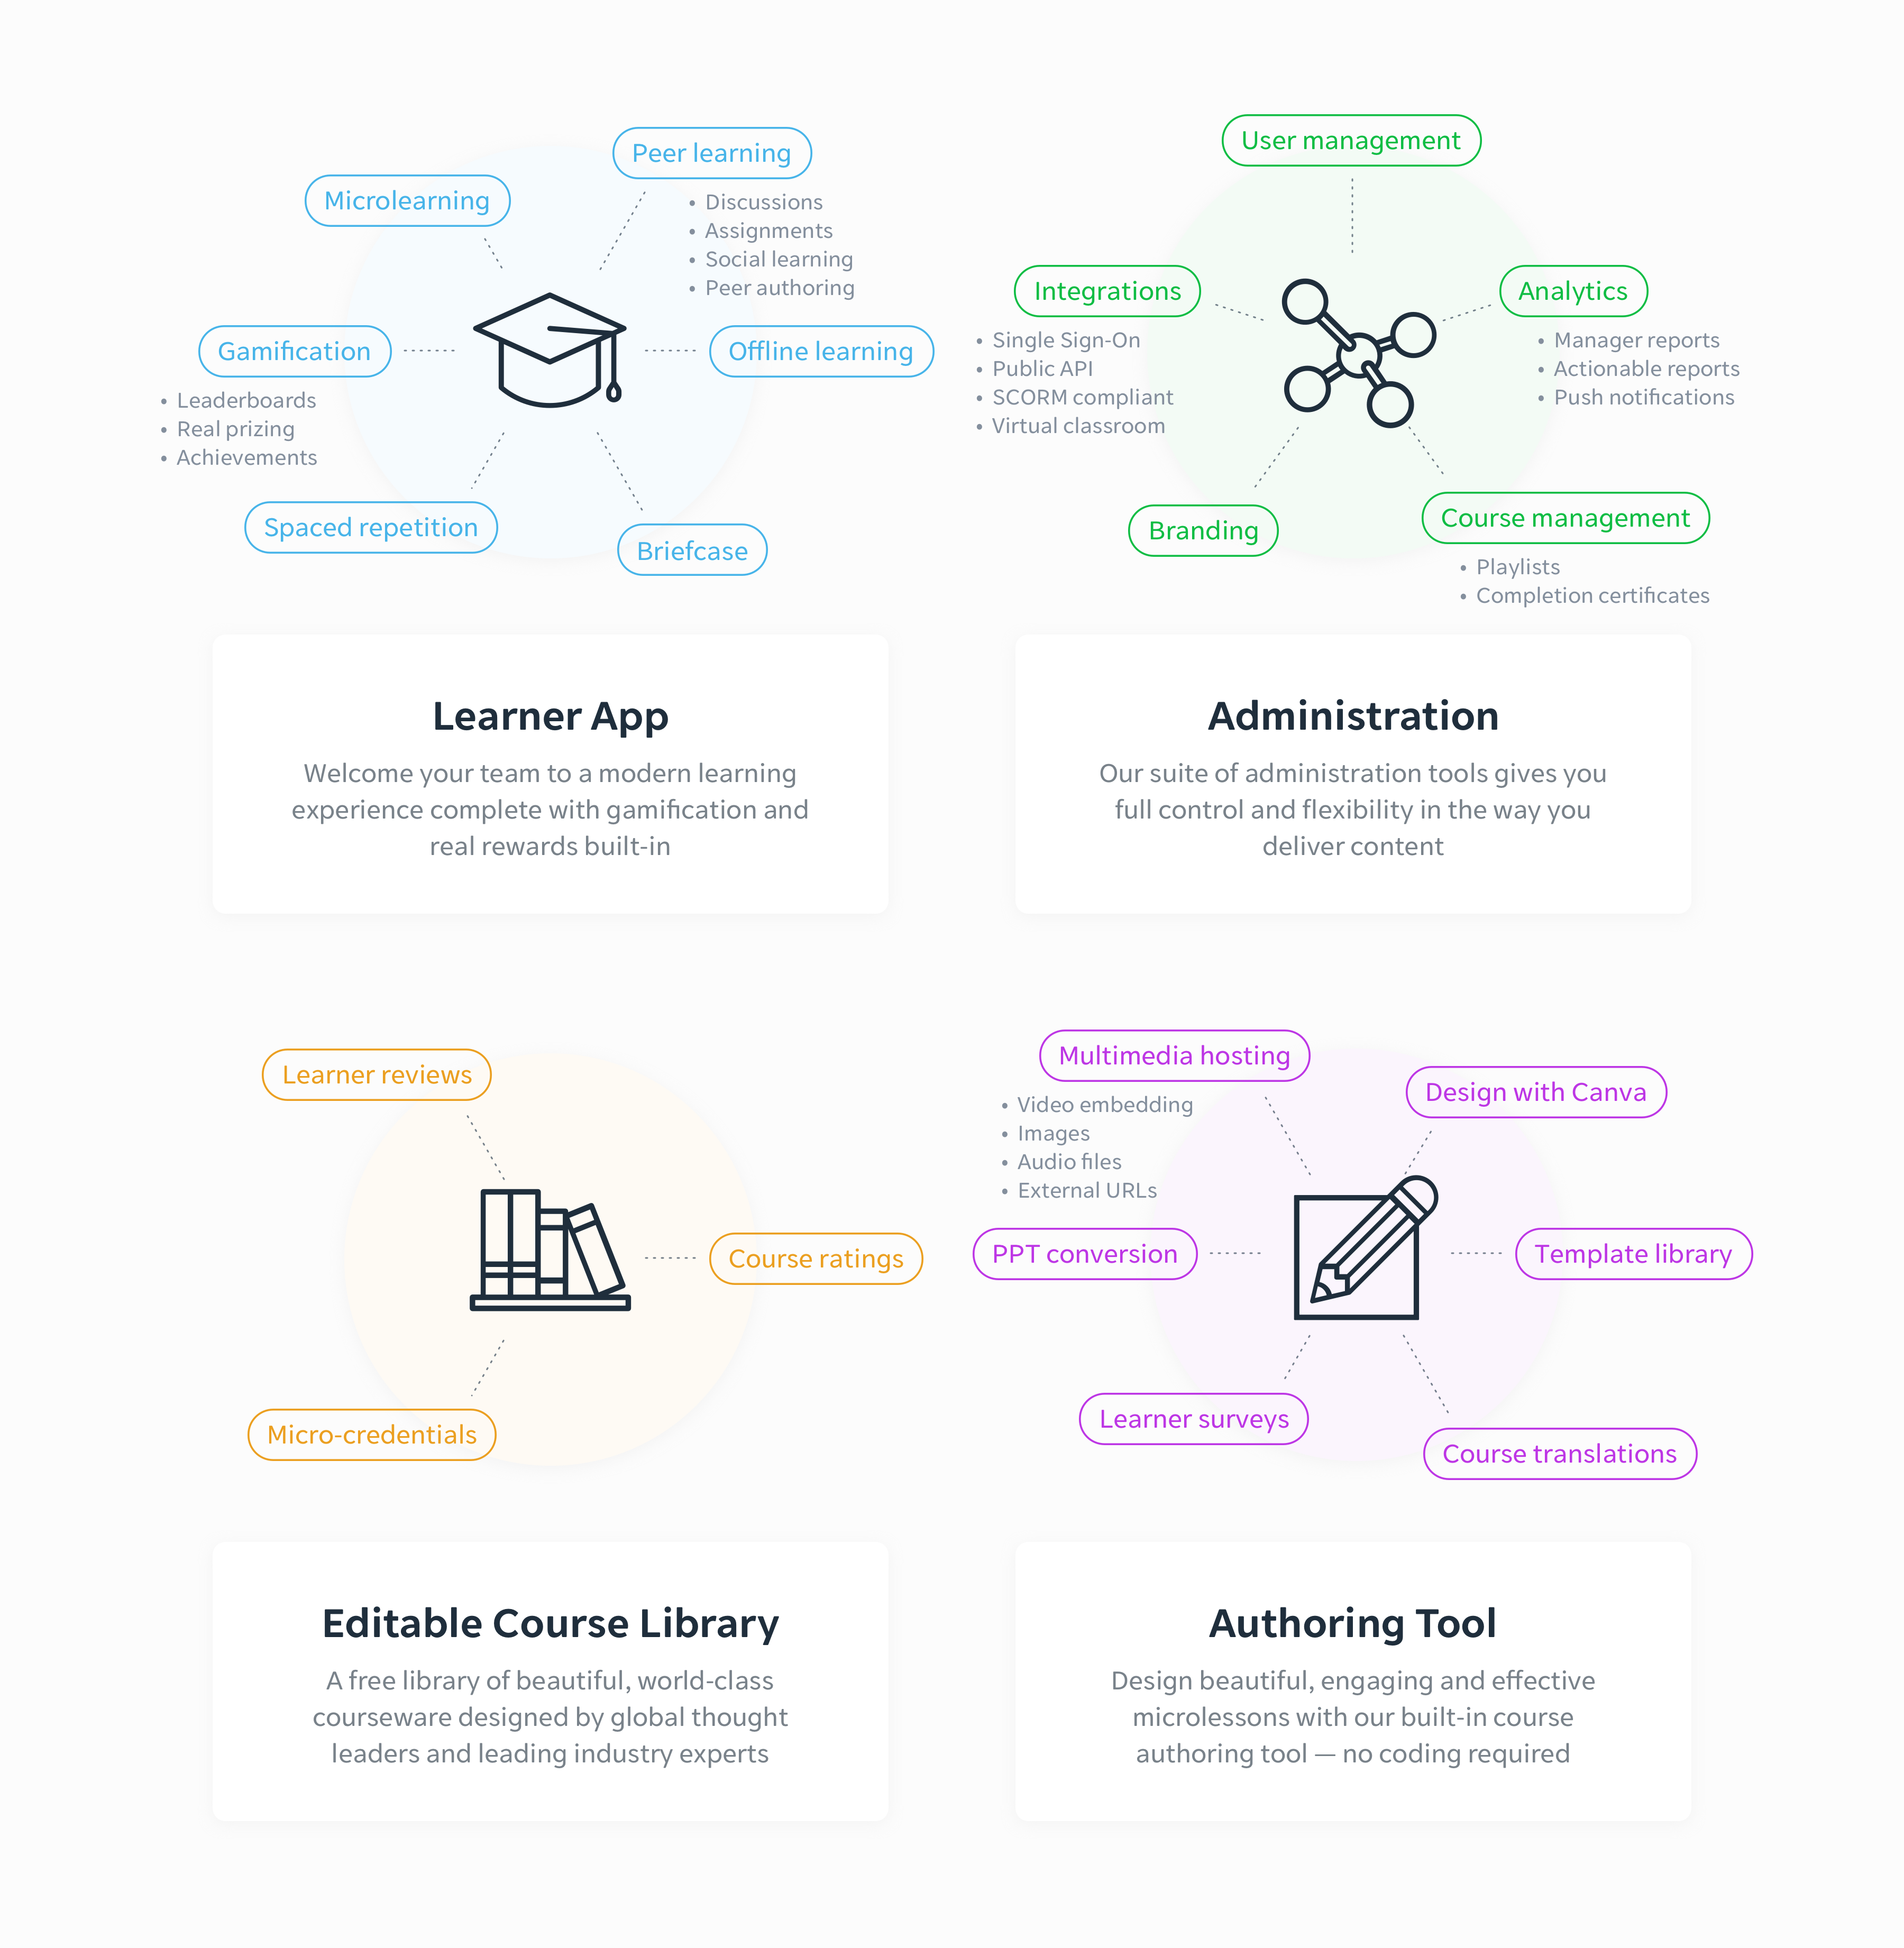 EdApp screenshot: EdApp's learning ecosystem.